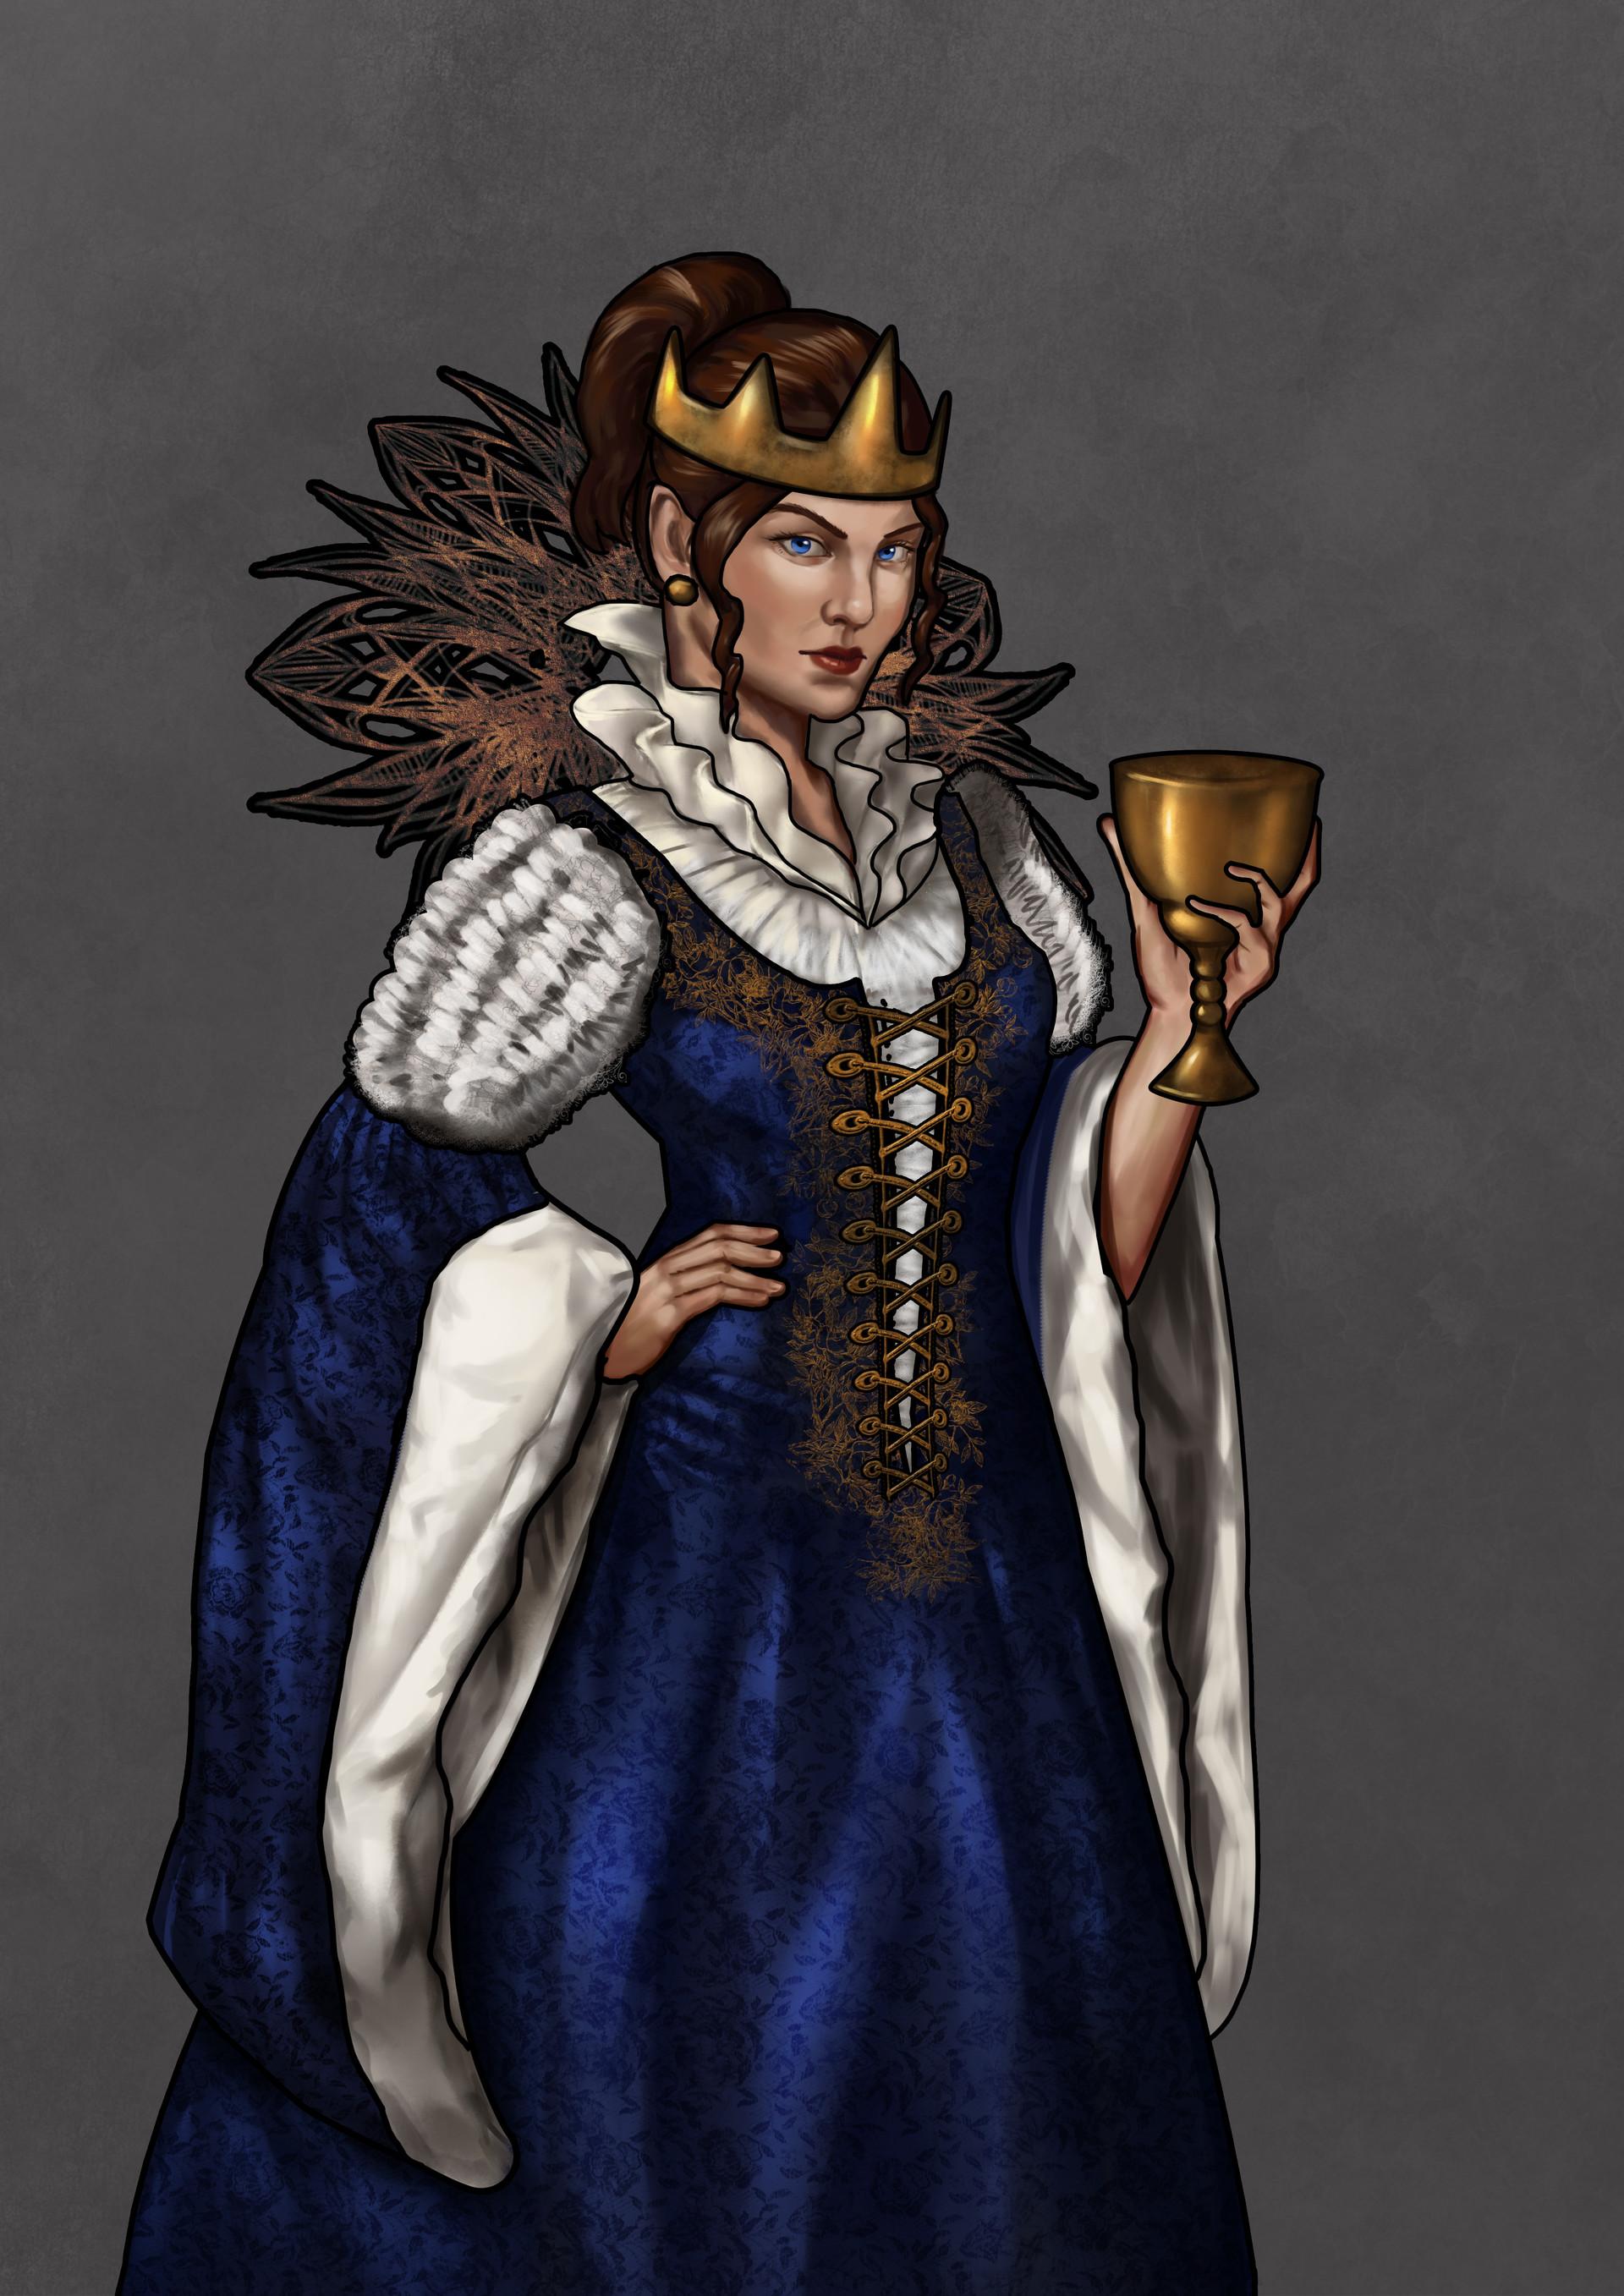 Joanna efenberger queen